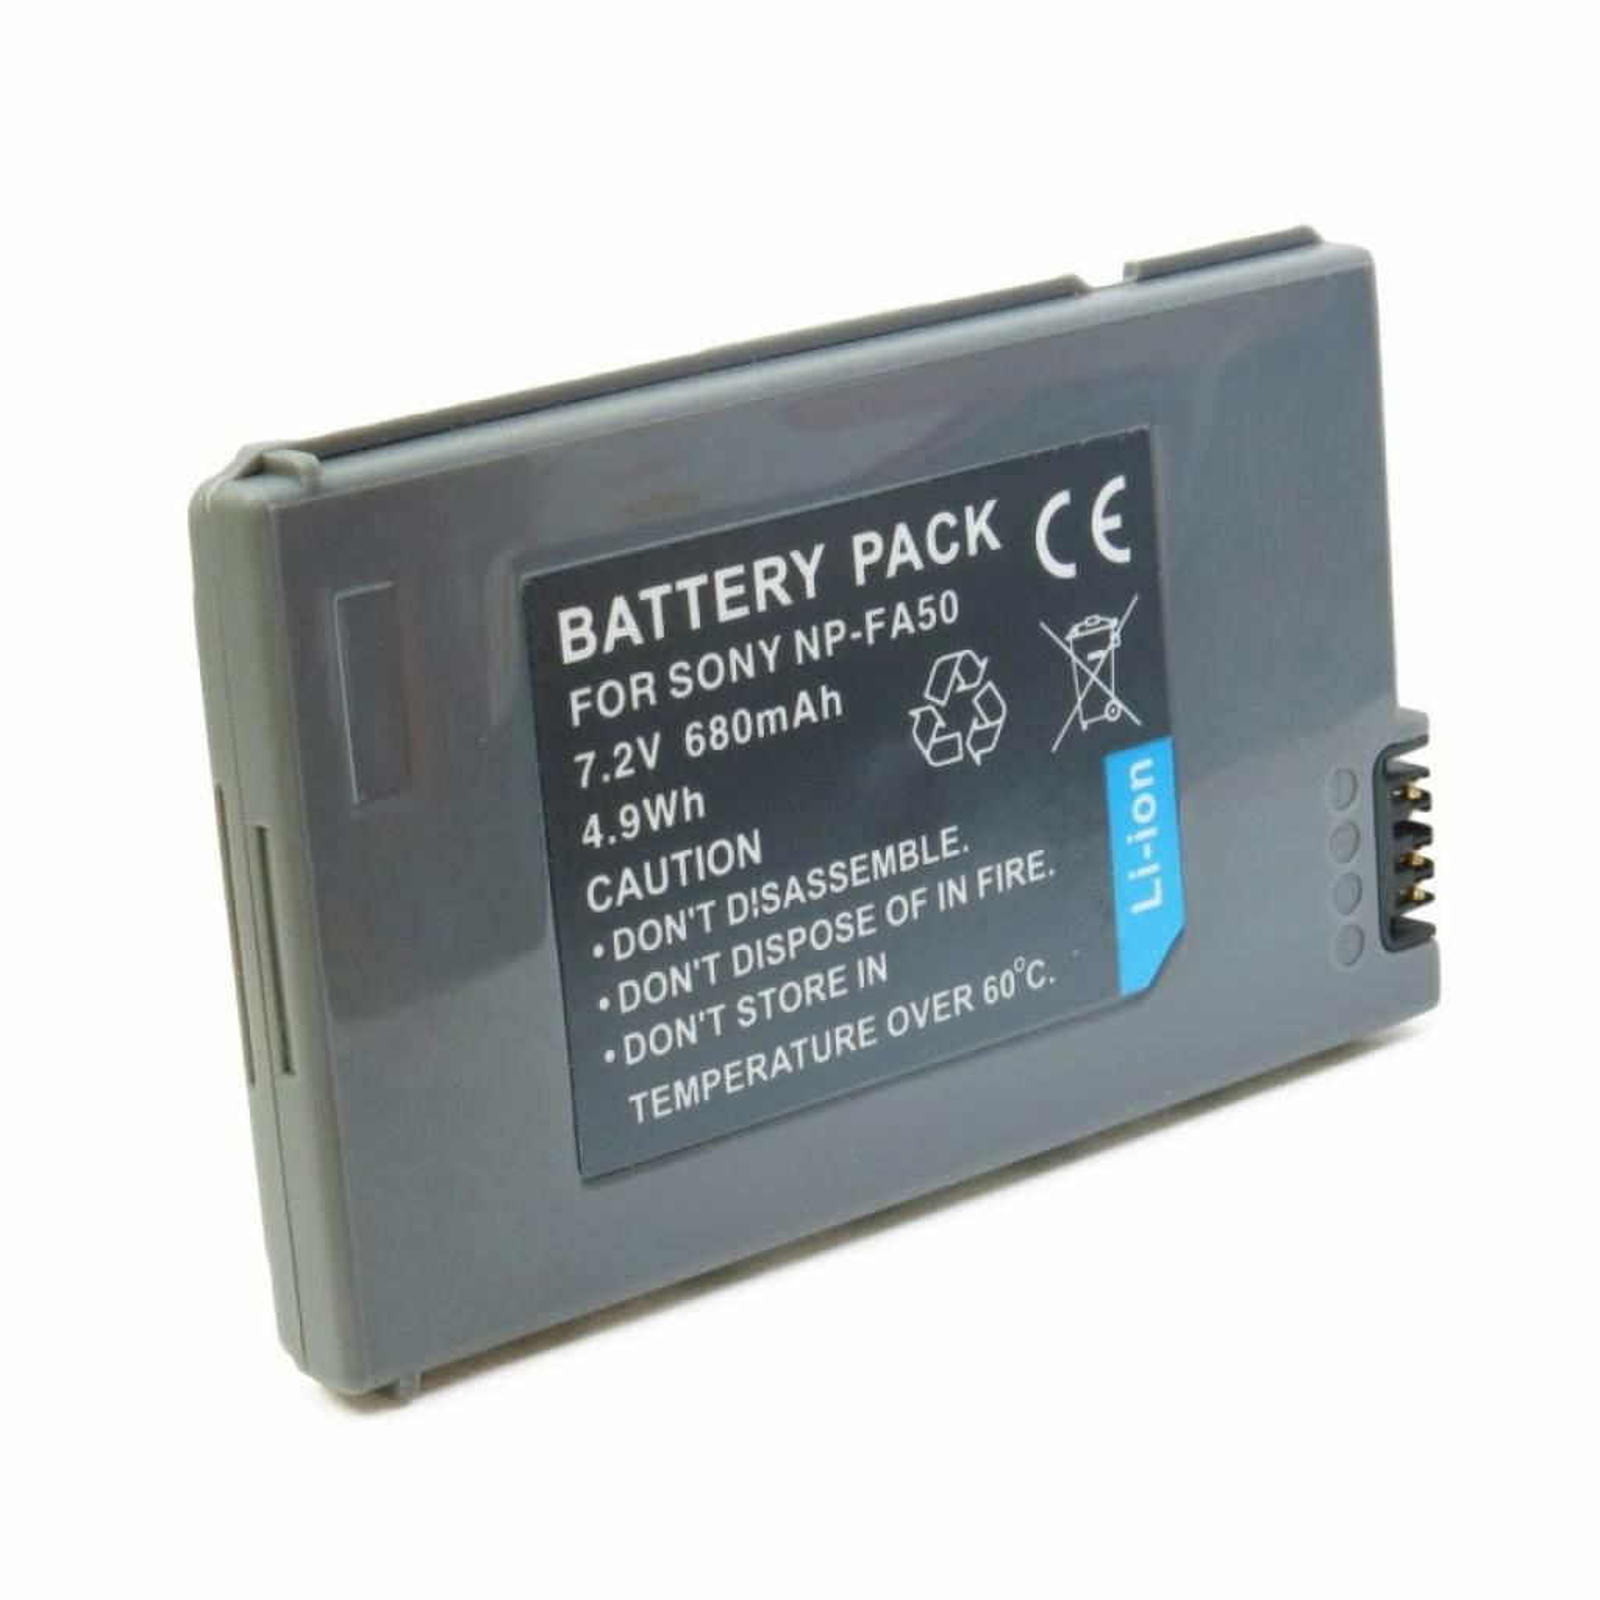 Аккумулятор к фото/видео EXTRADIGITAL Sony NP-FA50 (DV00DV1064) изображение 2